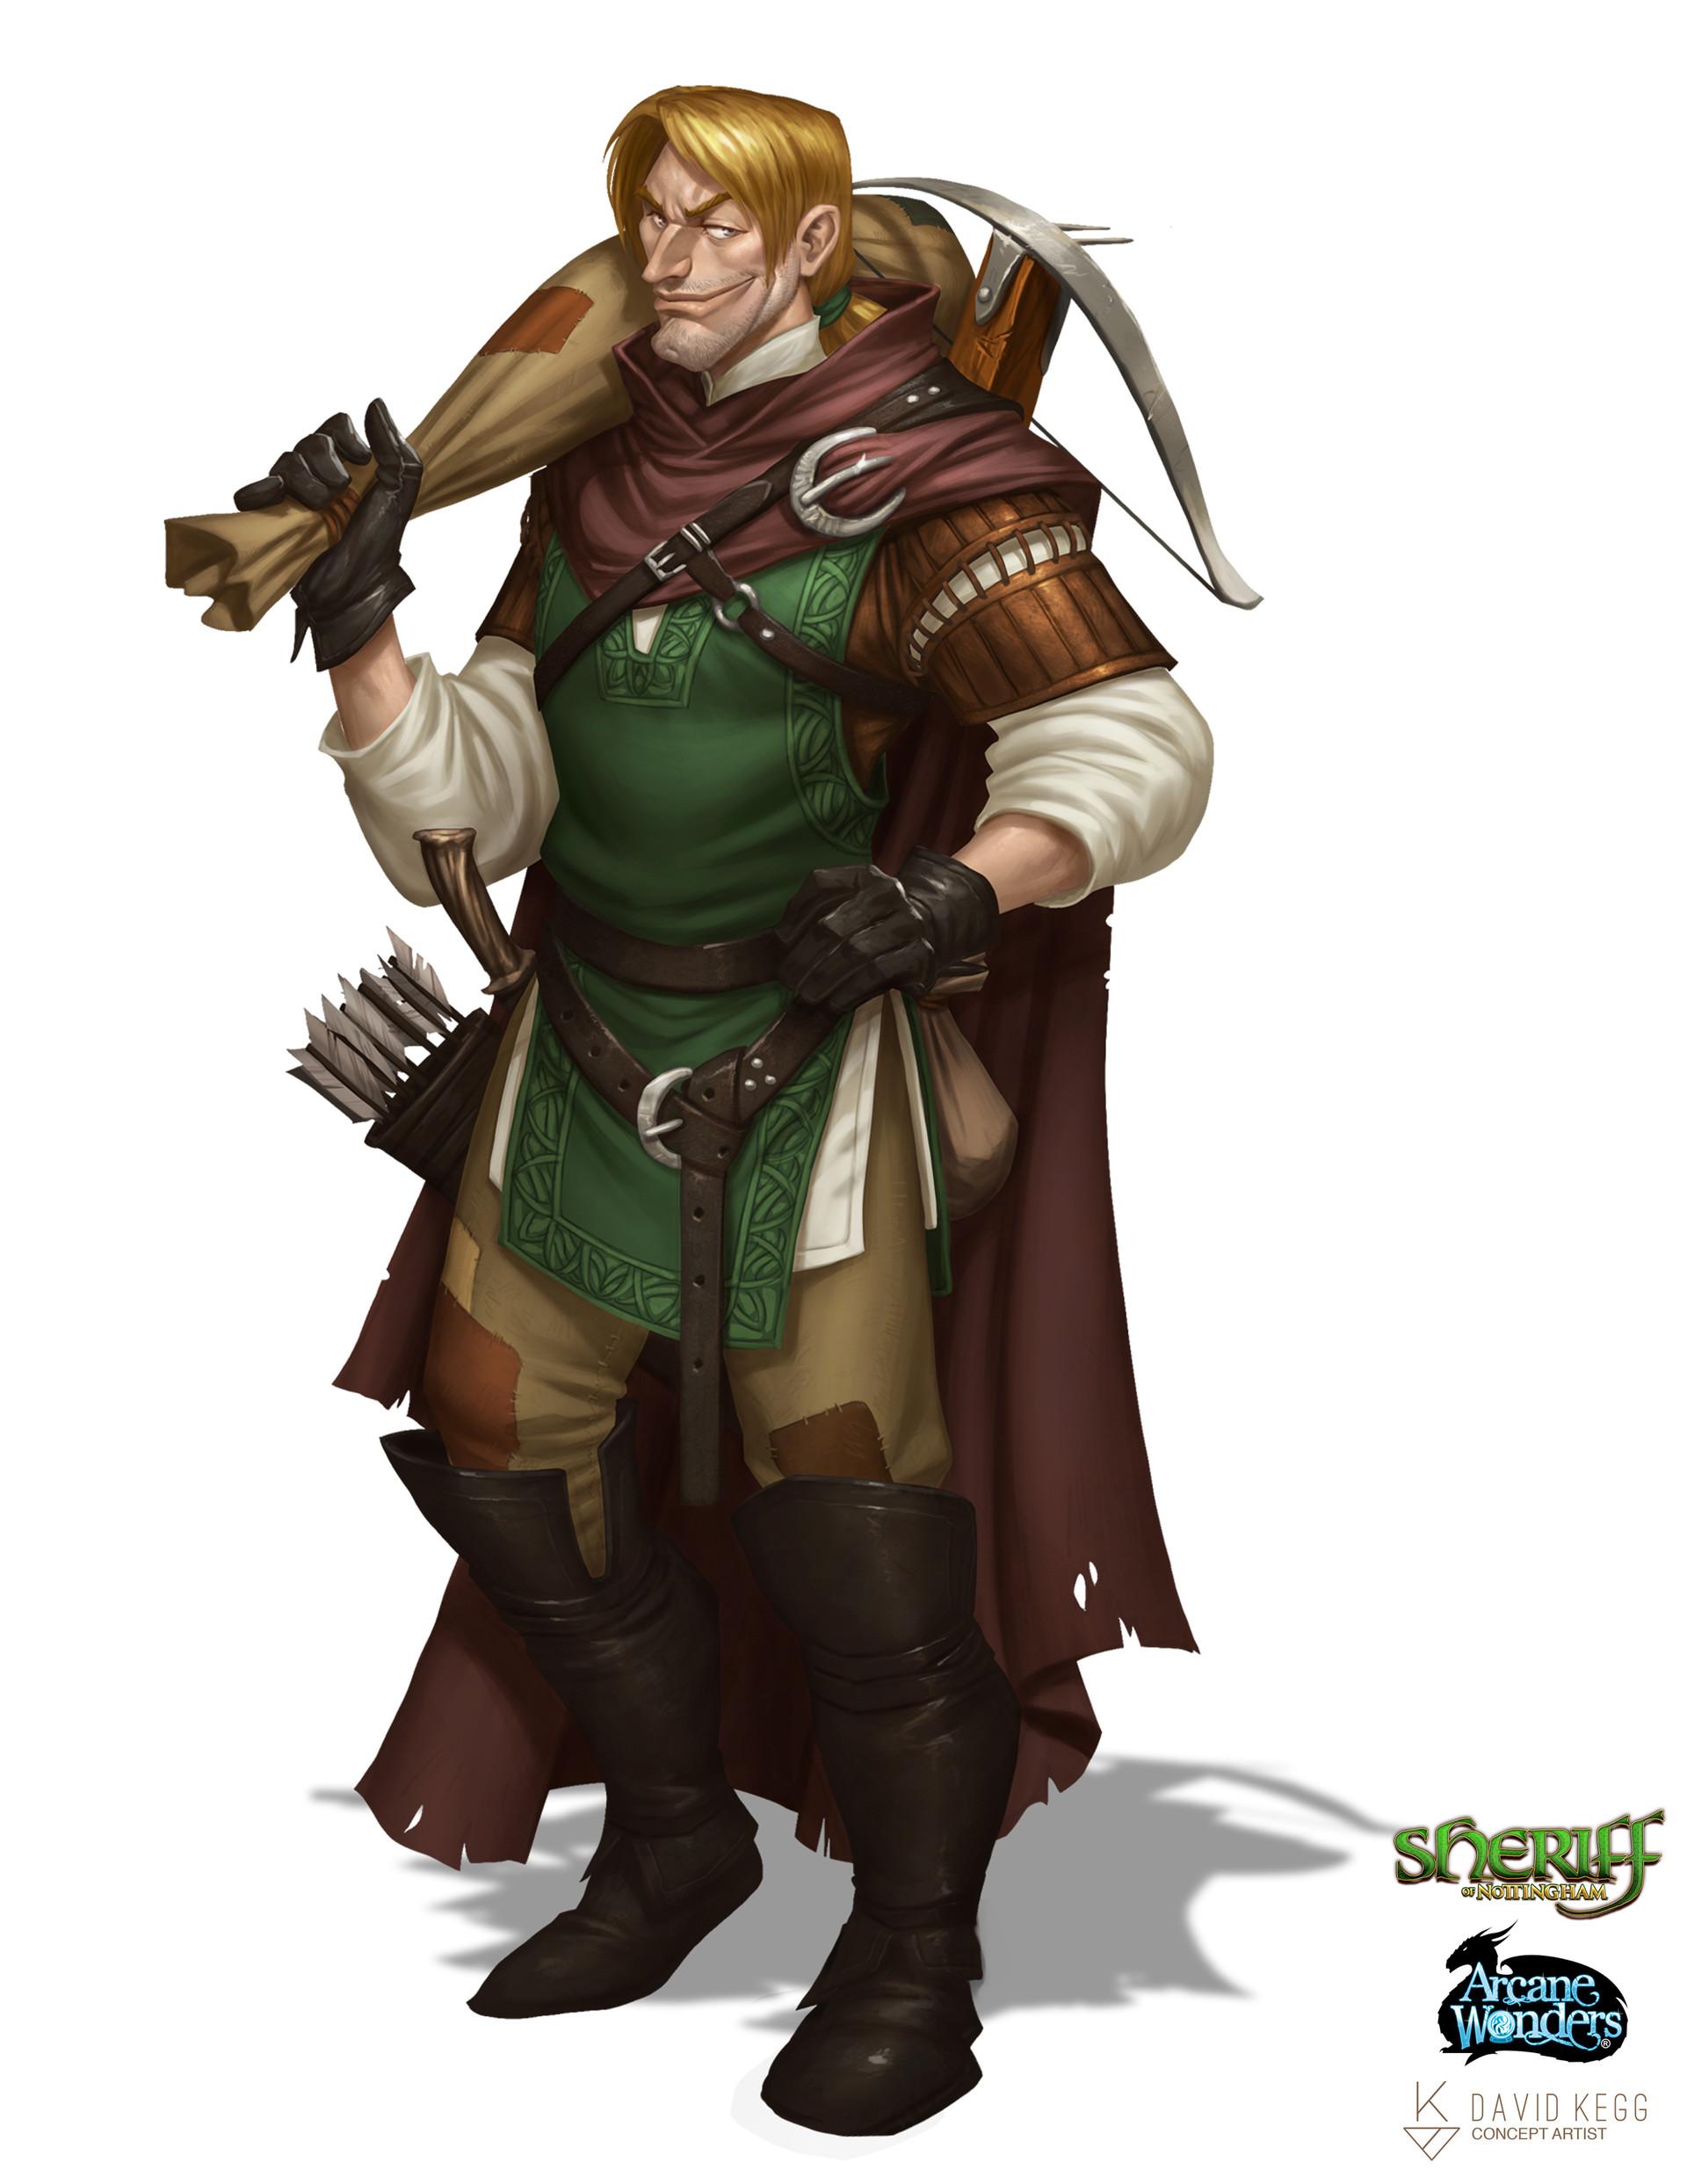 David kegg kegg portfoliomaster mar2016 sheriff 01